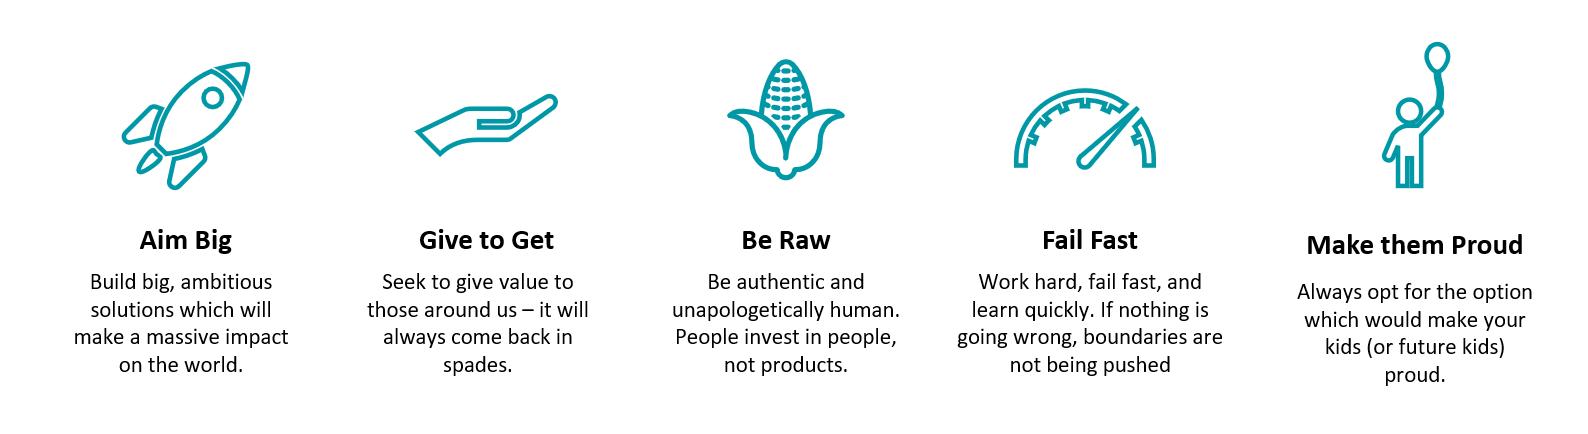 Ideas lab culture infographic.